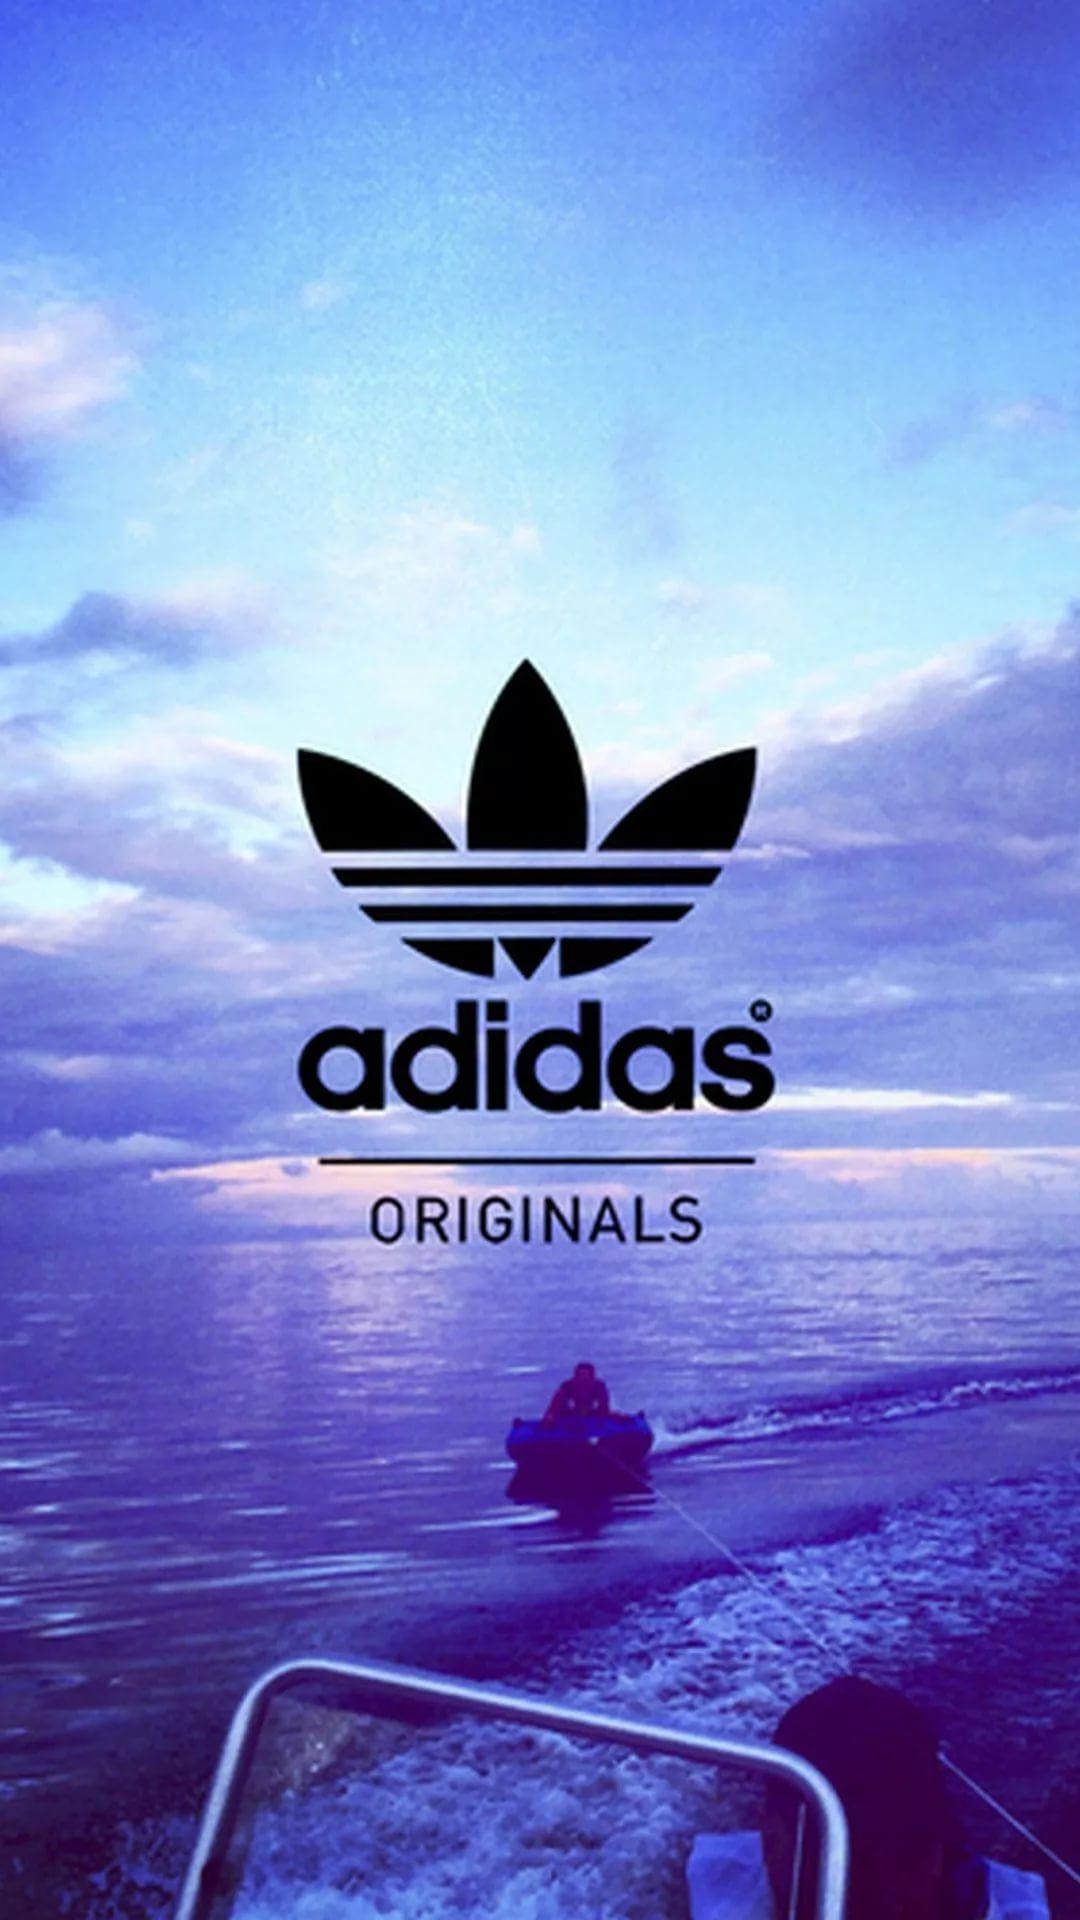 Adidas hd wallpaper